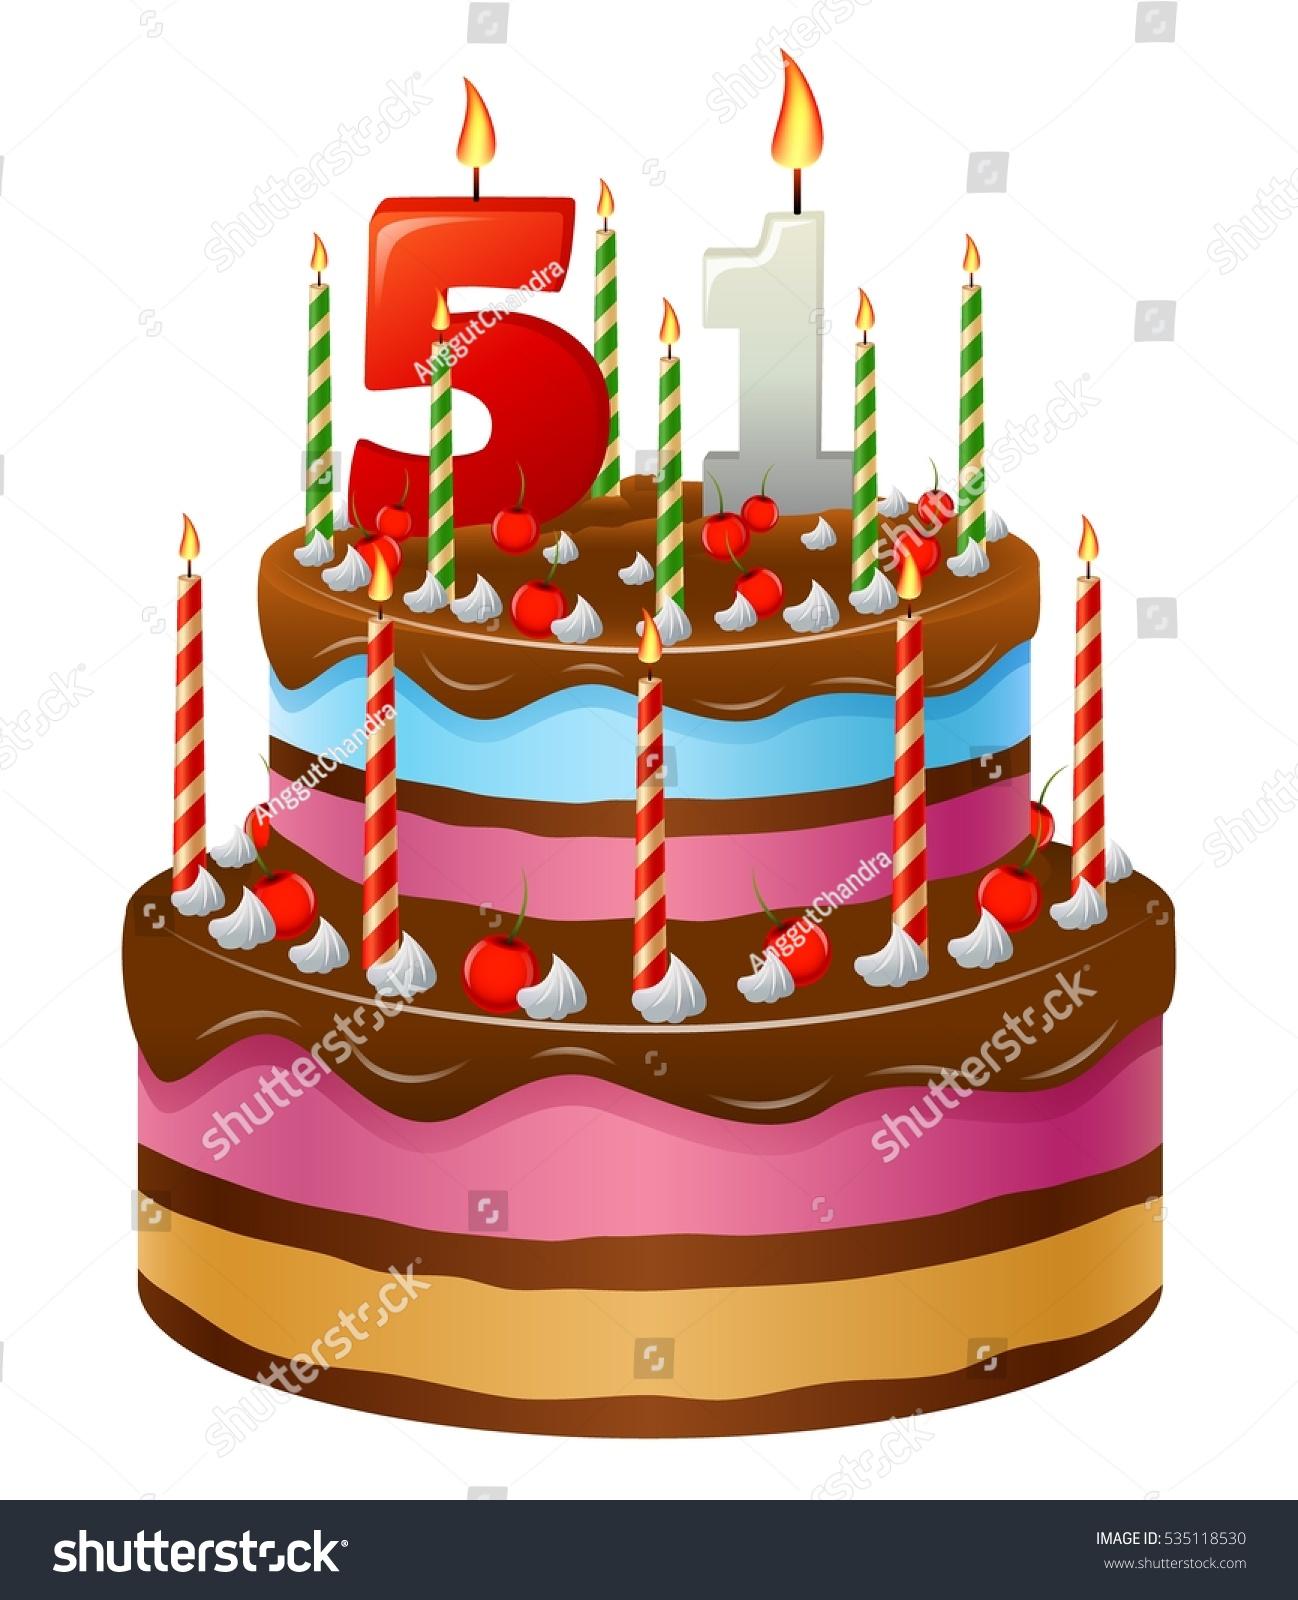 Groovy Happy Birthday Cake 51 Stock Vector Royalty Free 535118530 Funny Birthday Cards Online Inifofree Goldxyz